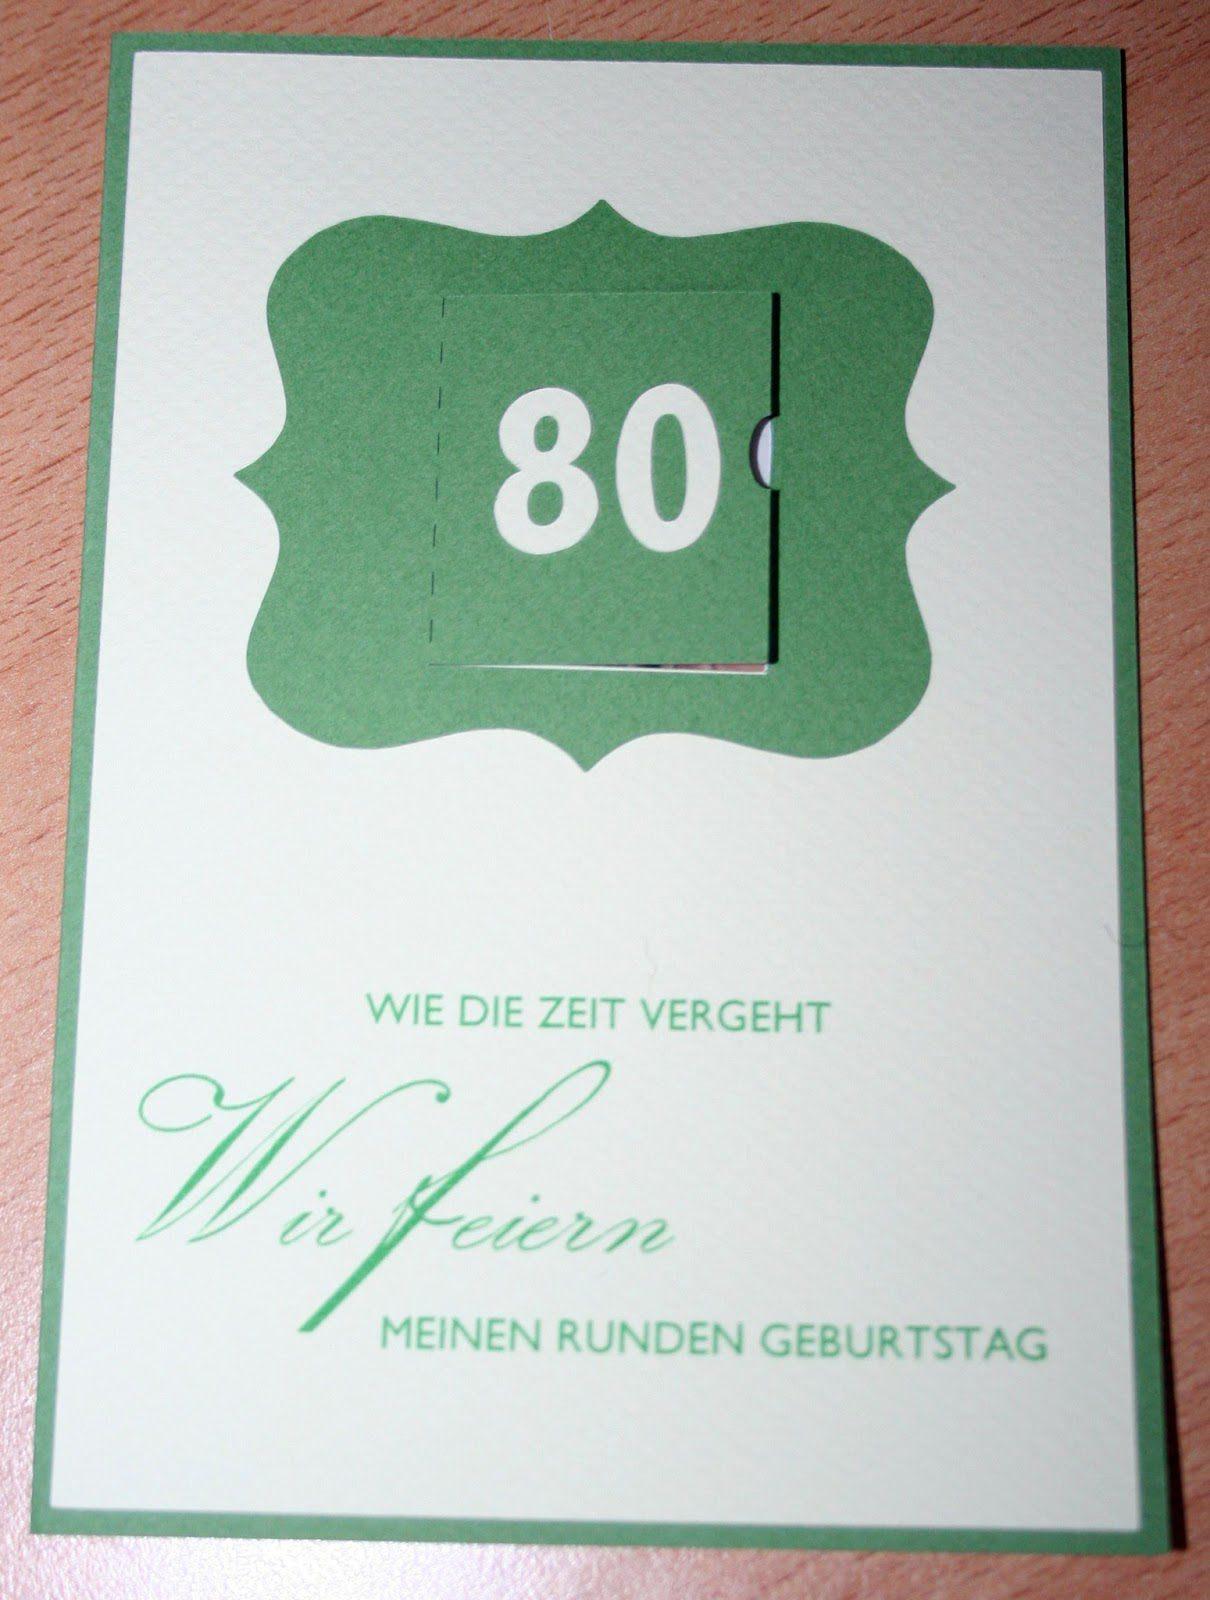 einladung zum 80 geburtstag einladung zum 80 geburtstag selbst gestalten geburstag. Black Bedroom Furniture Sets. Home Design Ideas